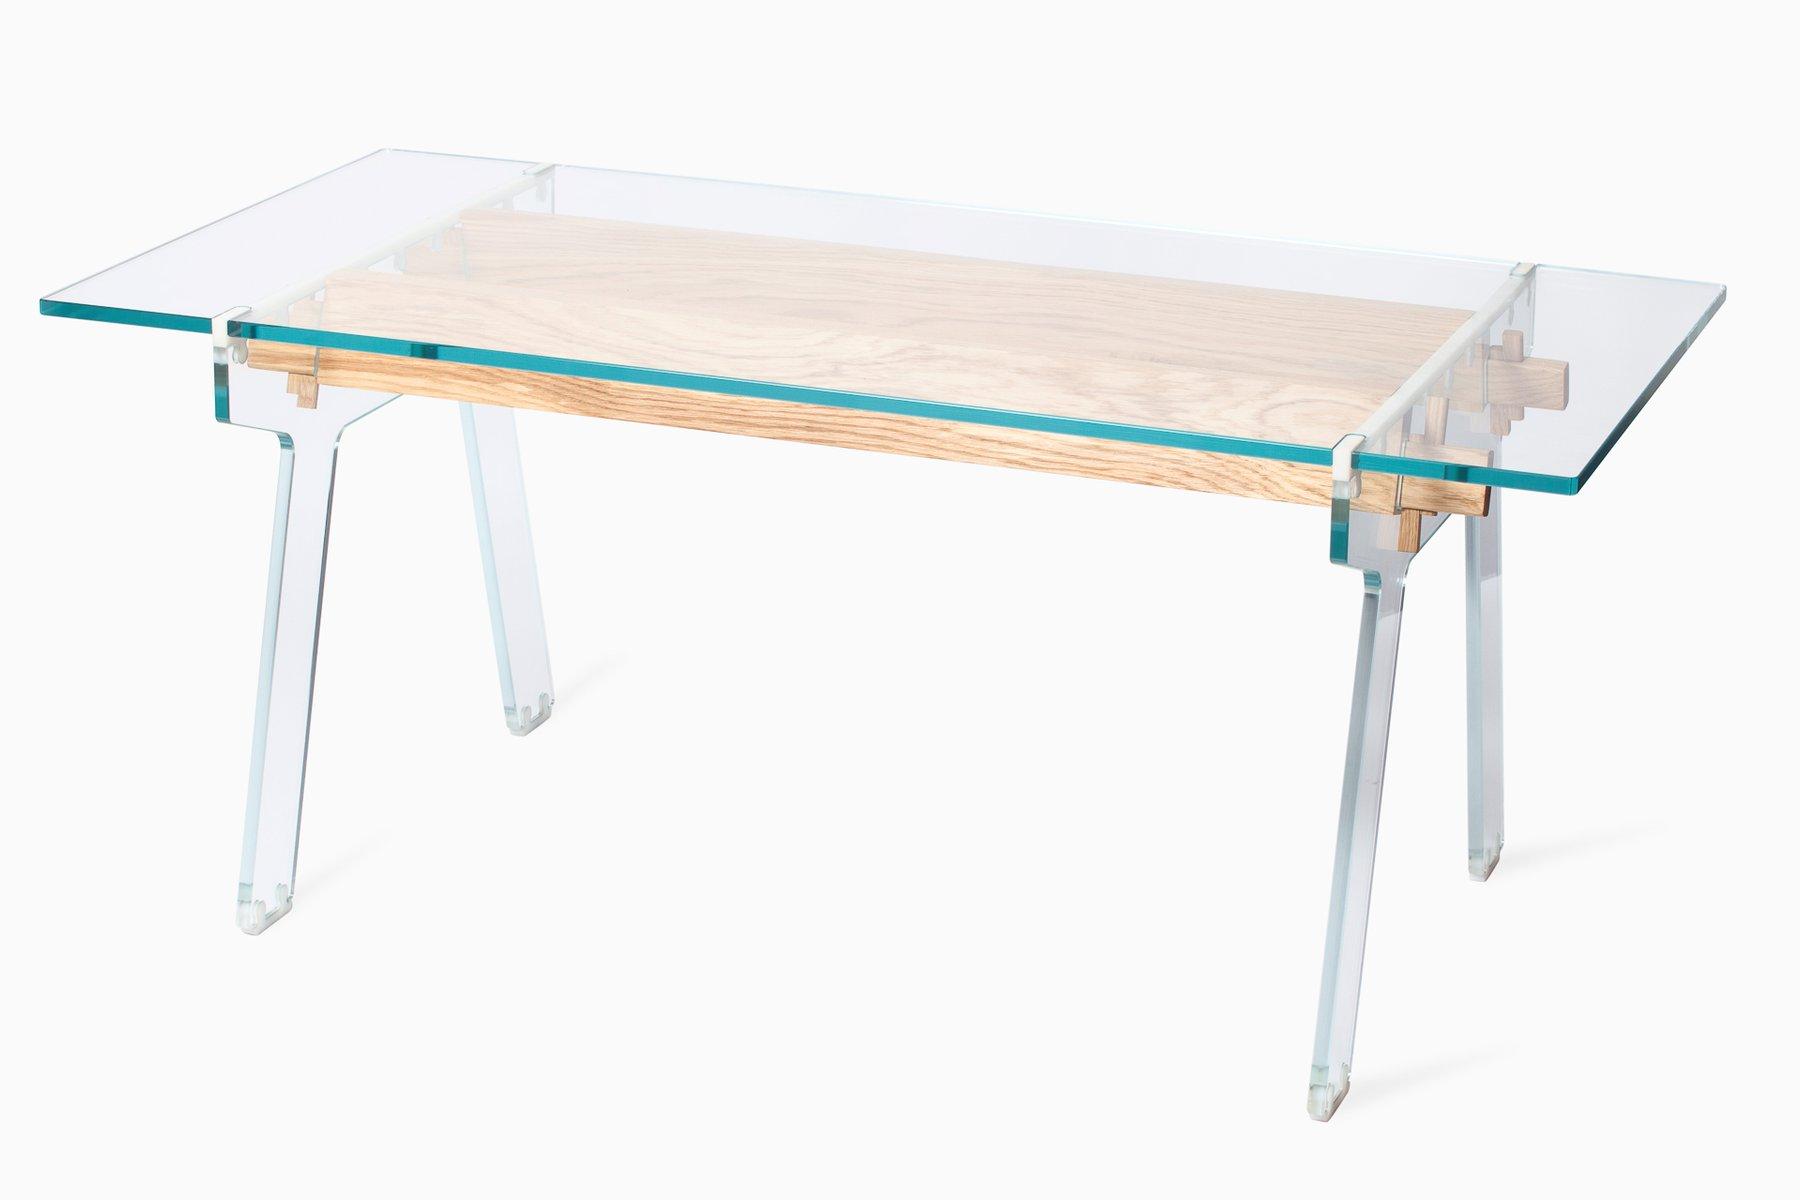 Laduz Table von Alexander Pelikan